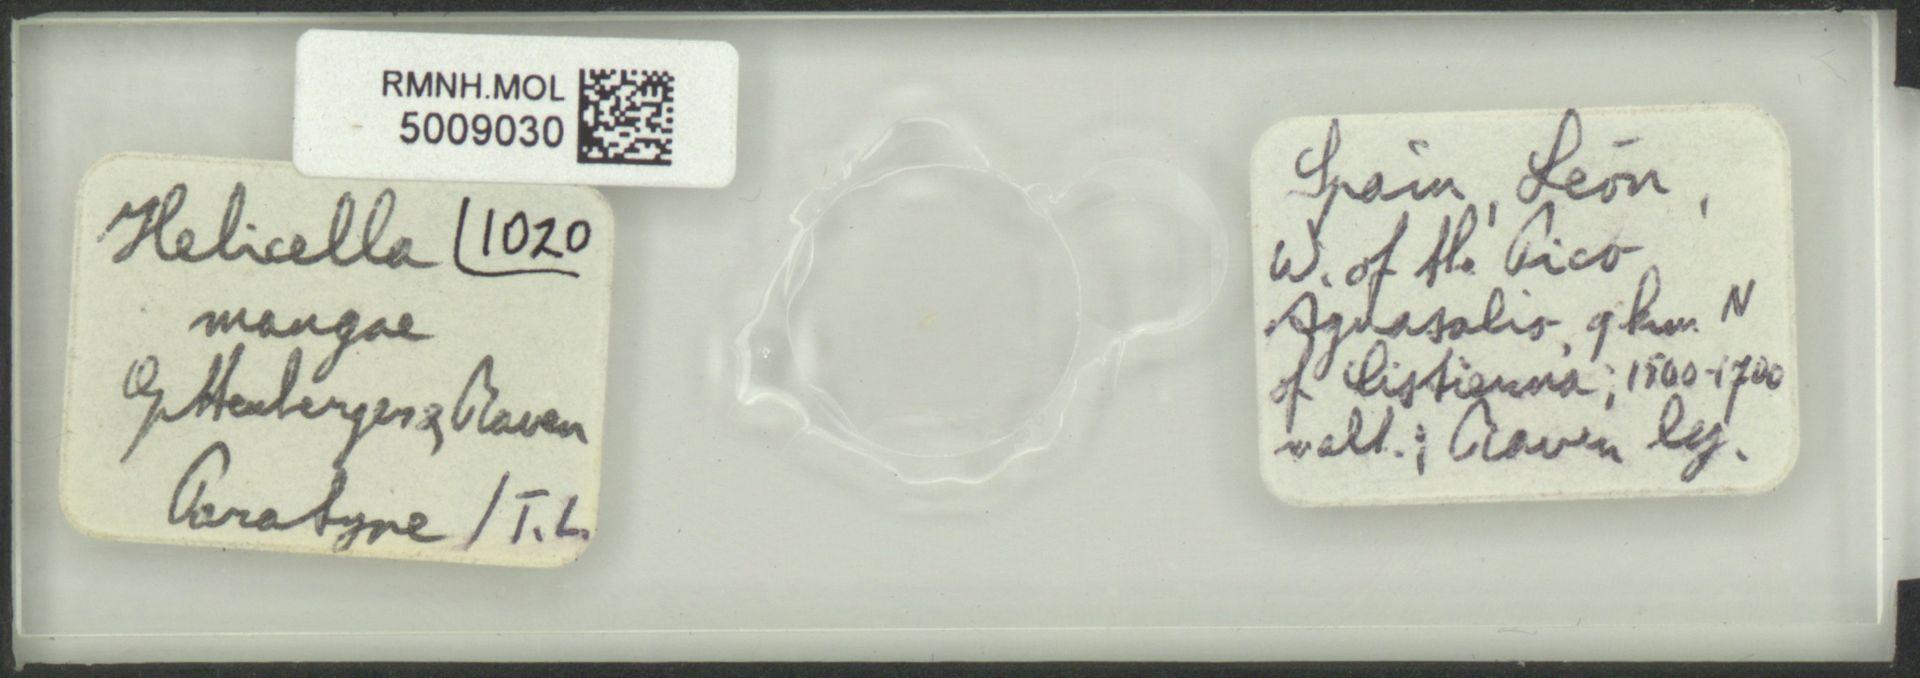 RMNH.MOL.5009030 | Helicella mangae Gittenberger & Raven, 1982